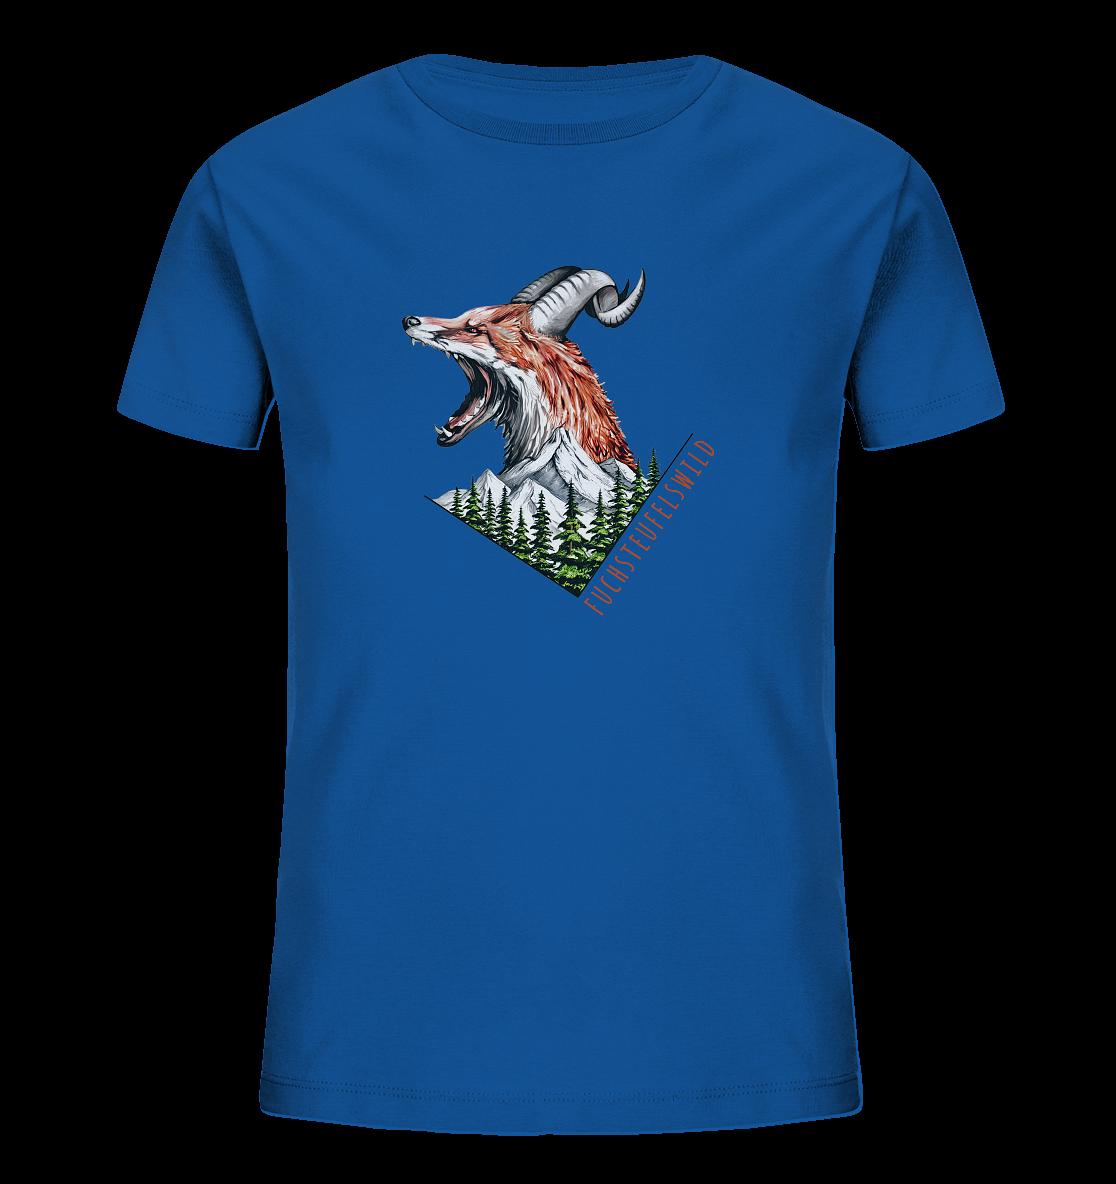 front-kids-organic-shirt-13569c-1116x.png